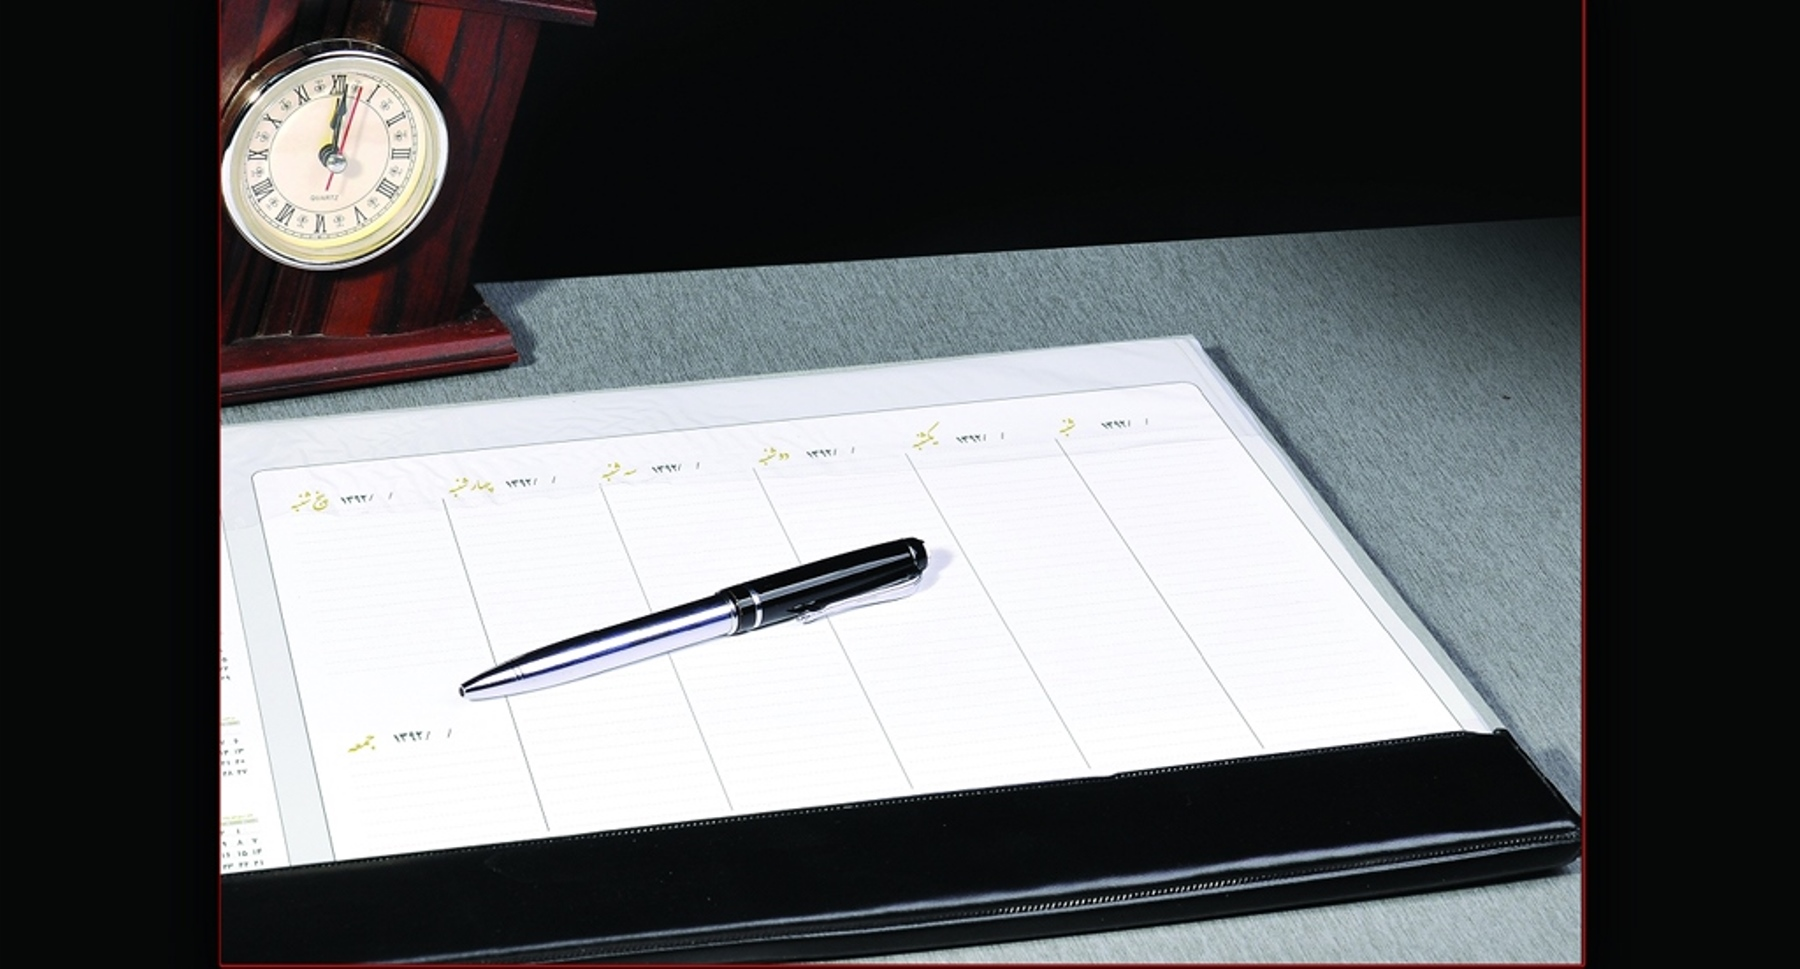 تقویم زیردستی با کاغذ کتان